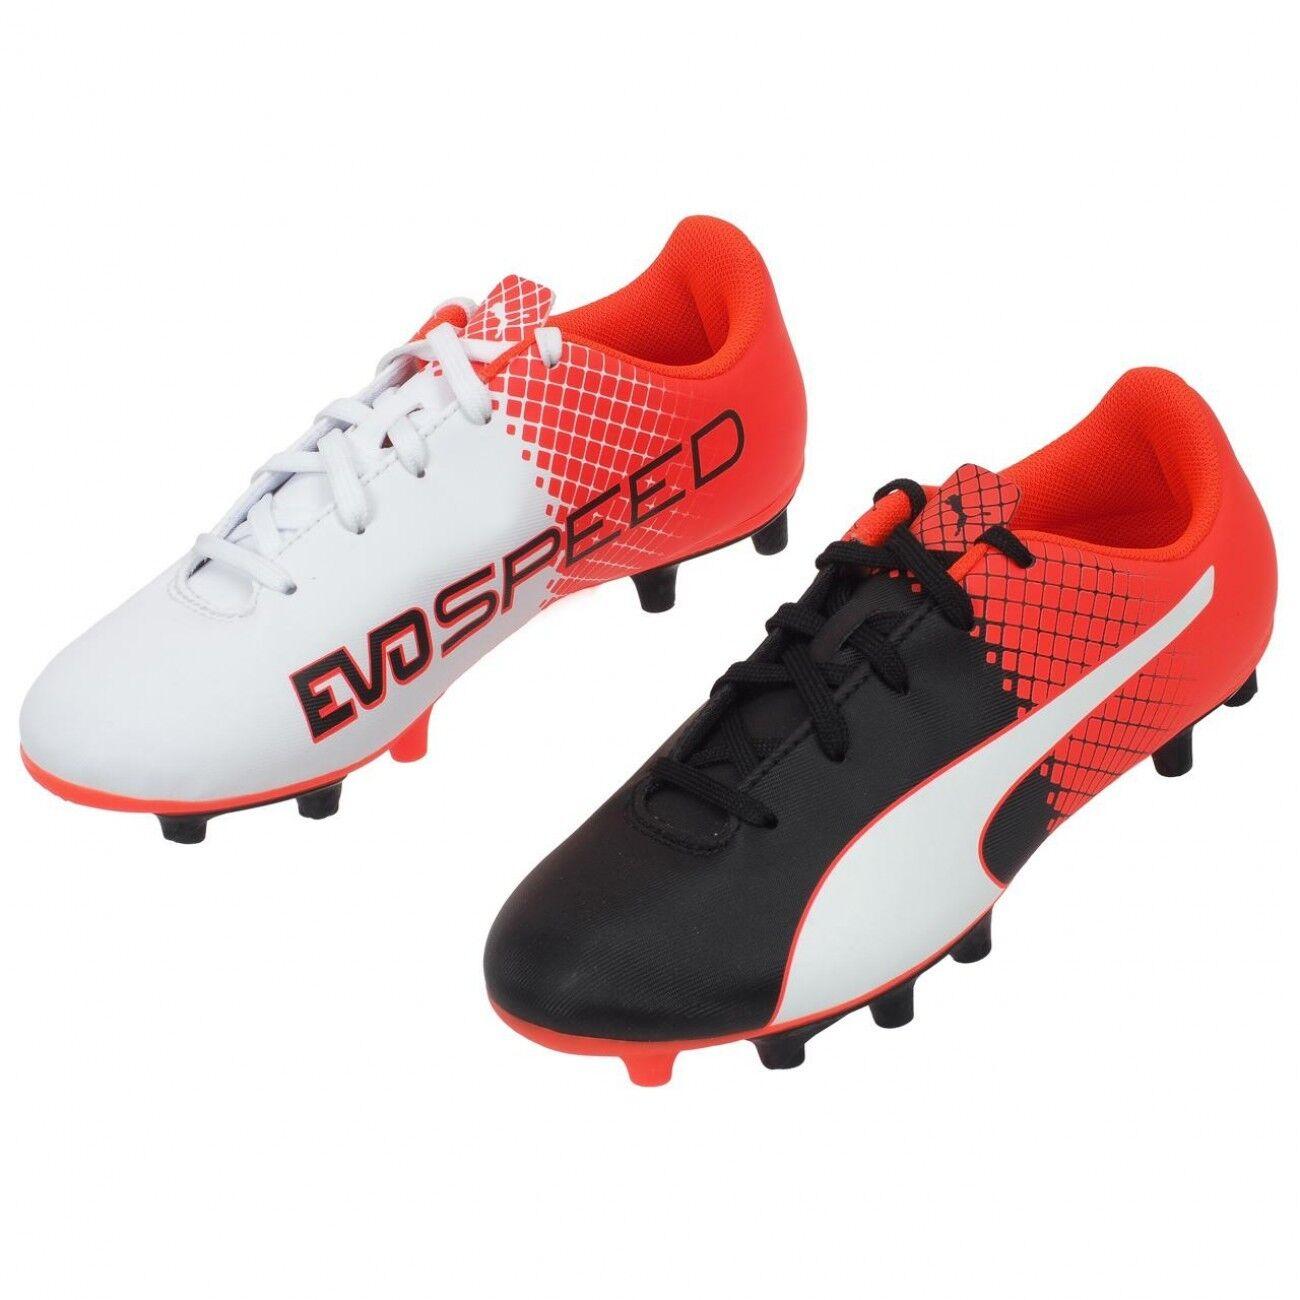 Crampons Puma Evospeed FG 5.5 FG Evospeed chaussures neuves avec boite P 42.5  (8.5 UK) 0a8db0